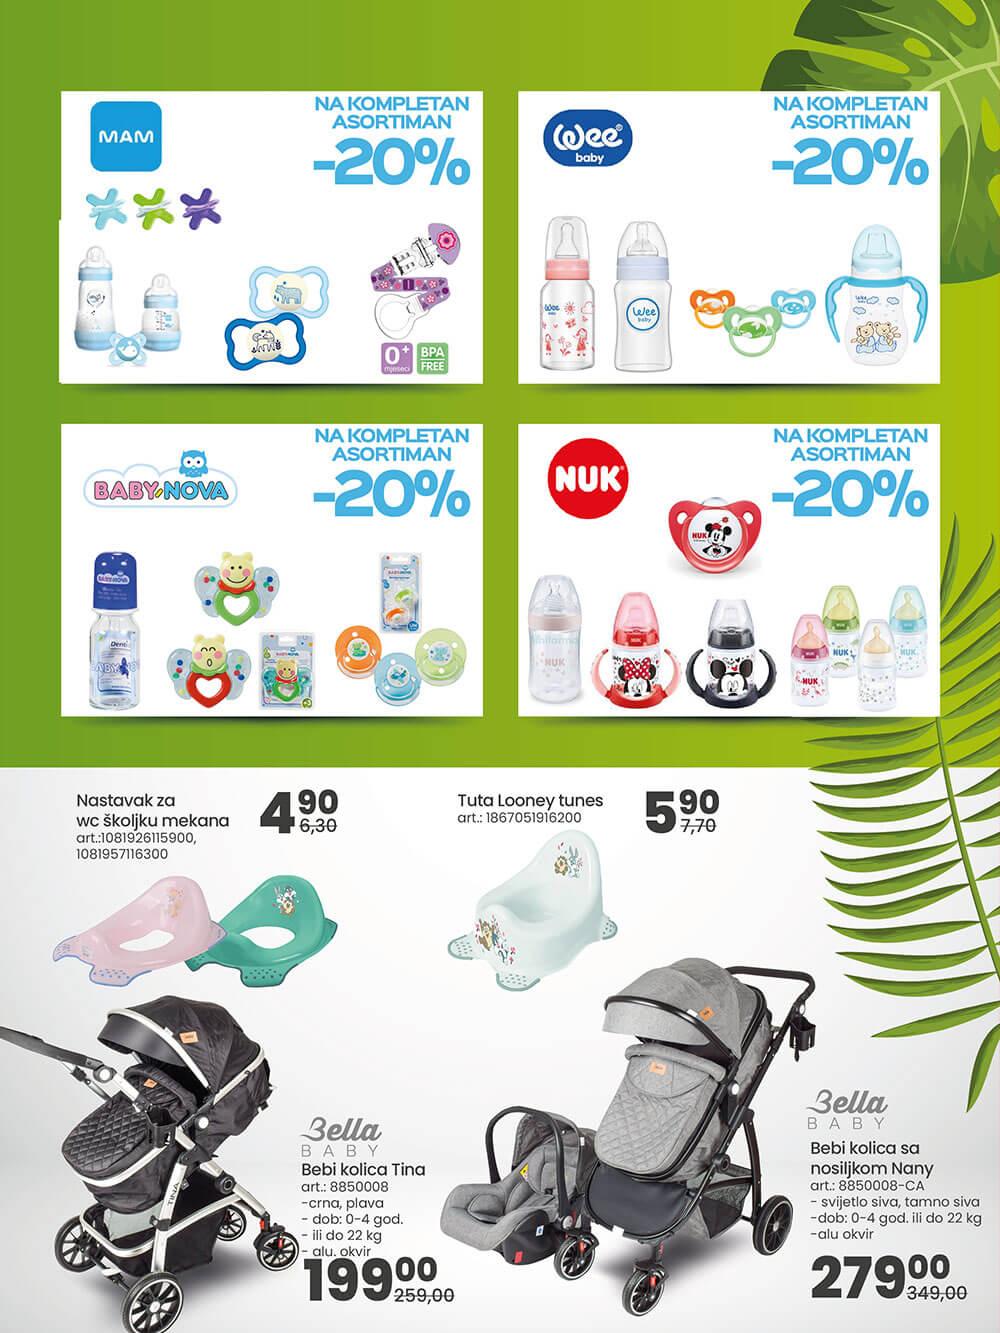 FIS Akcijski Katalog JUN 2021 eKatalozi.com 04.06. 23.06. 13